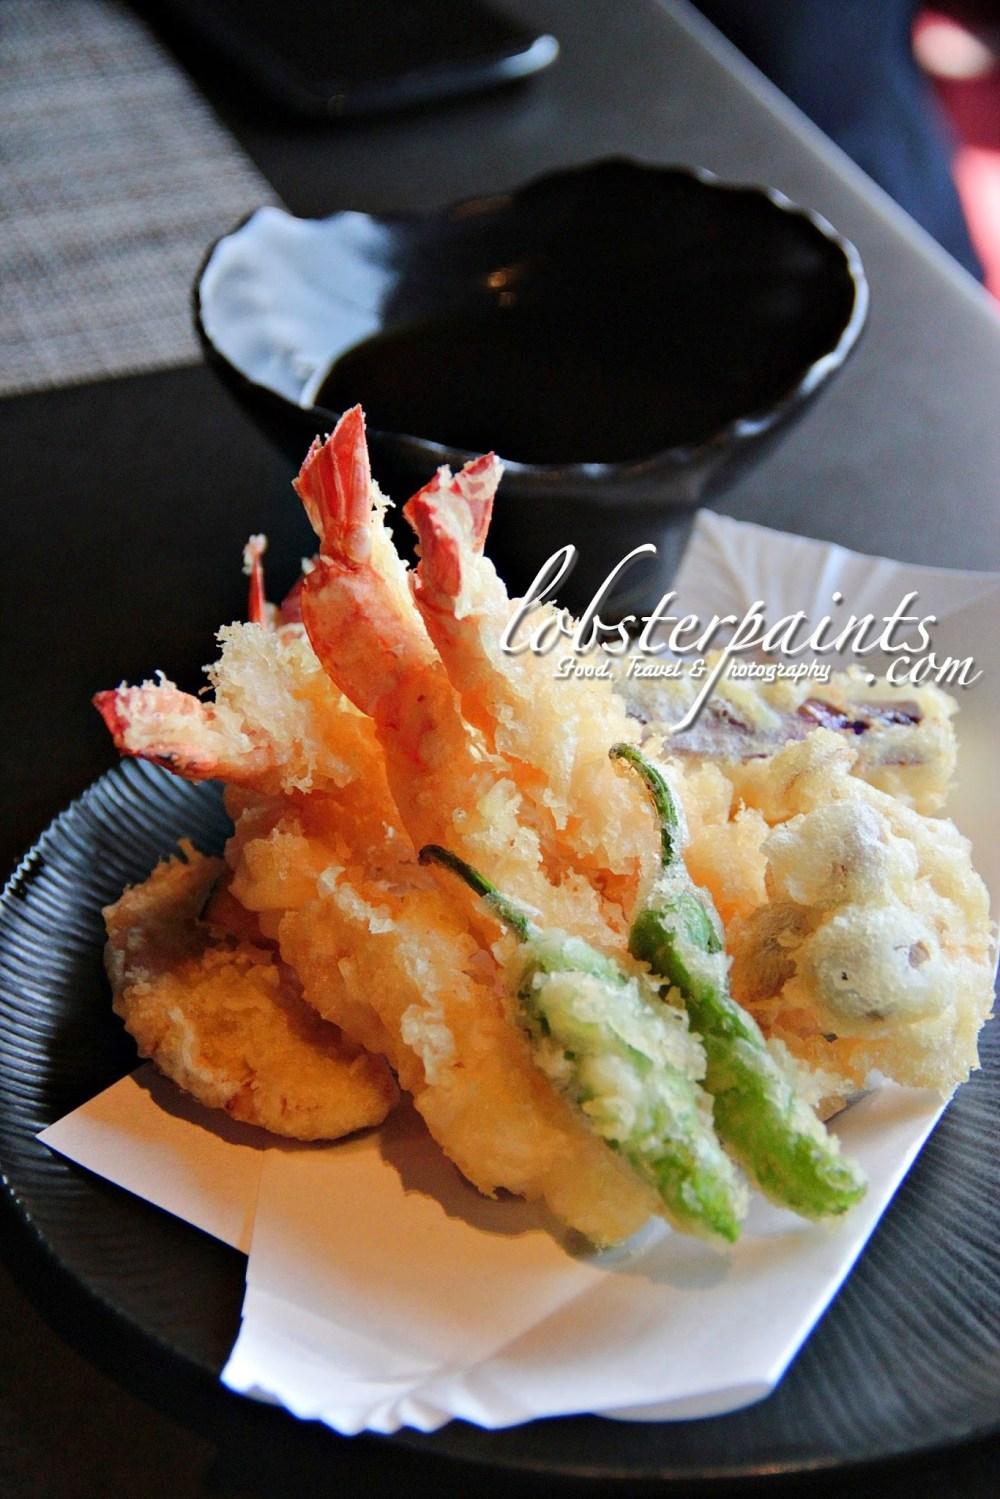 雜錦天婦羅 @ 天 Sky 21 Bar & Restaurant | Macau, China